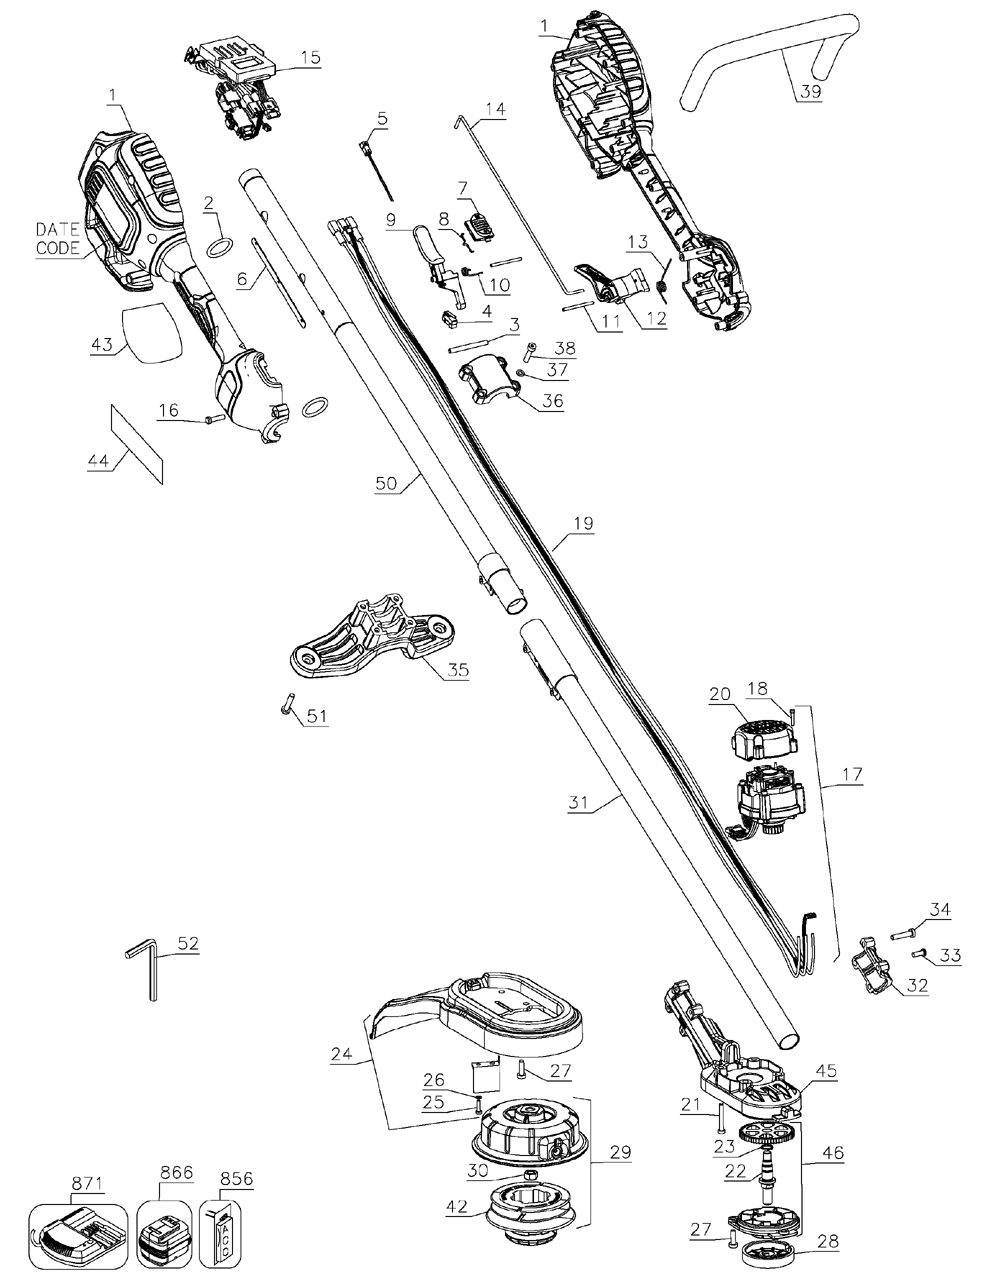 Weedeater Featherlite Fuel Line Parts Diagram Weed Eater